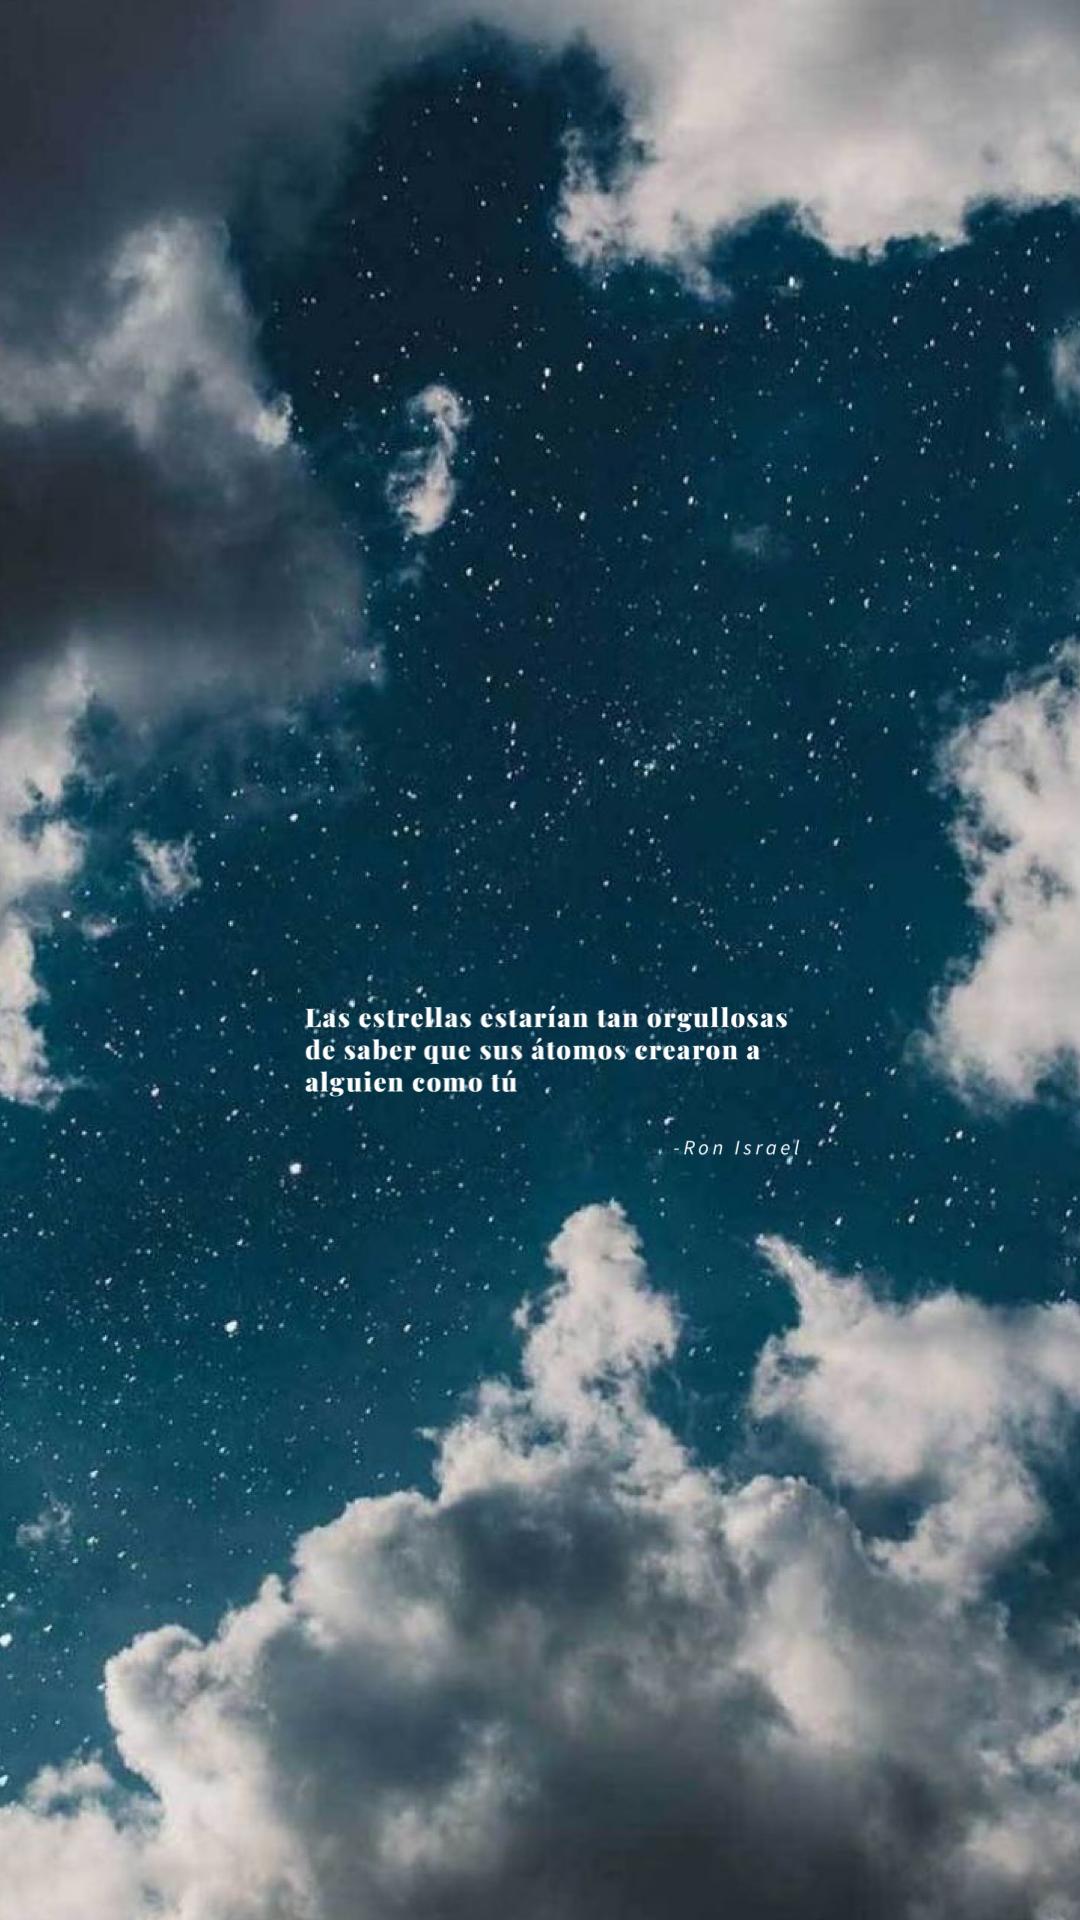 Wallpaper Sky Cloud Blue Frases Cielo Azul Frases Cielo Frases Instagram Cortas